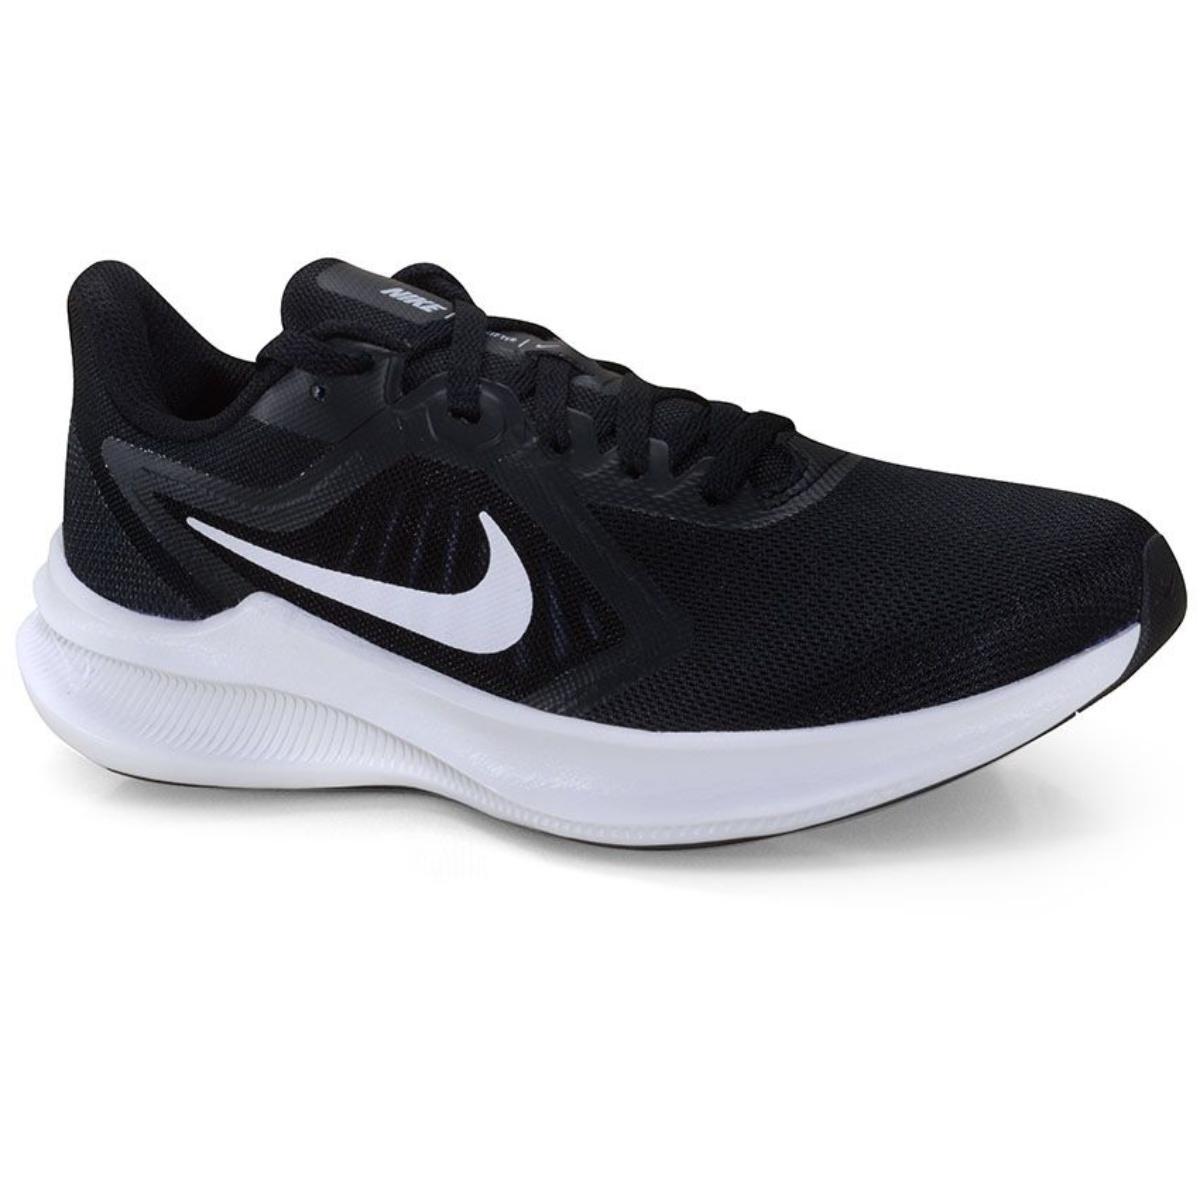 Tênis Feminino Nike Ci9984-001 Downshifter 10 Preto/branco